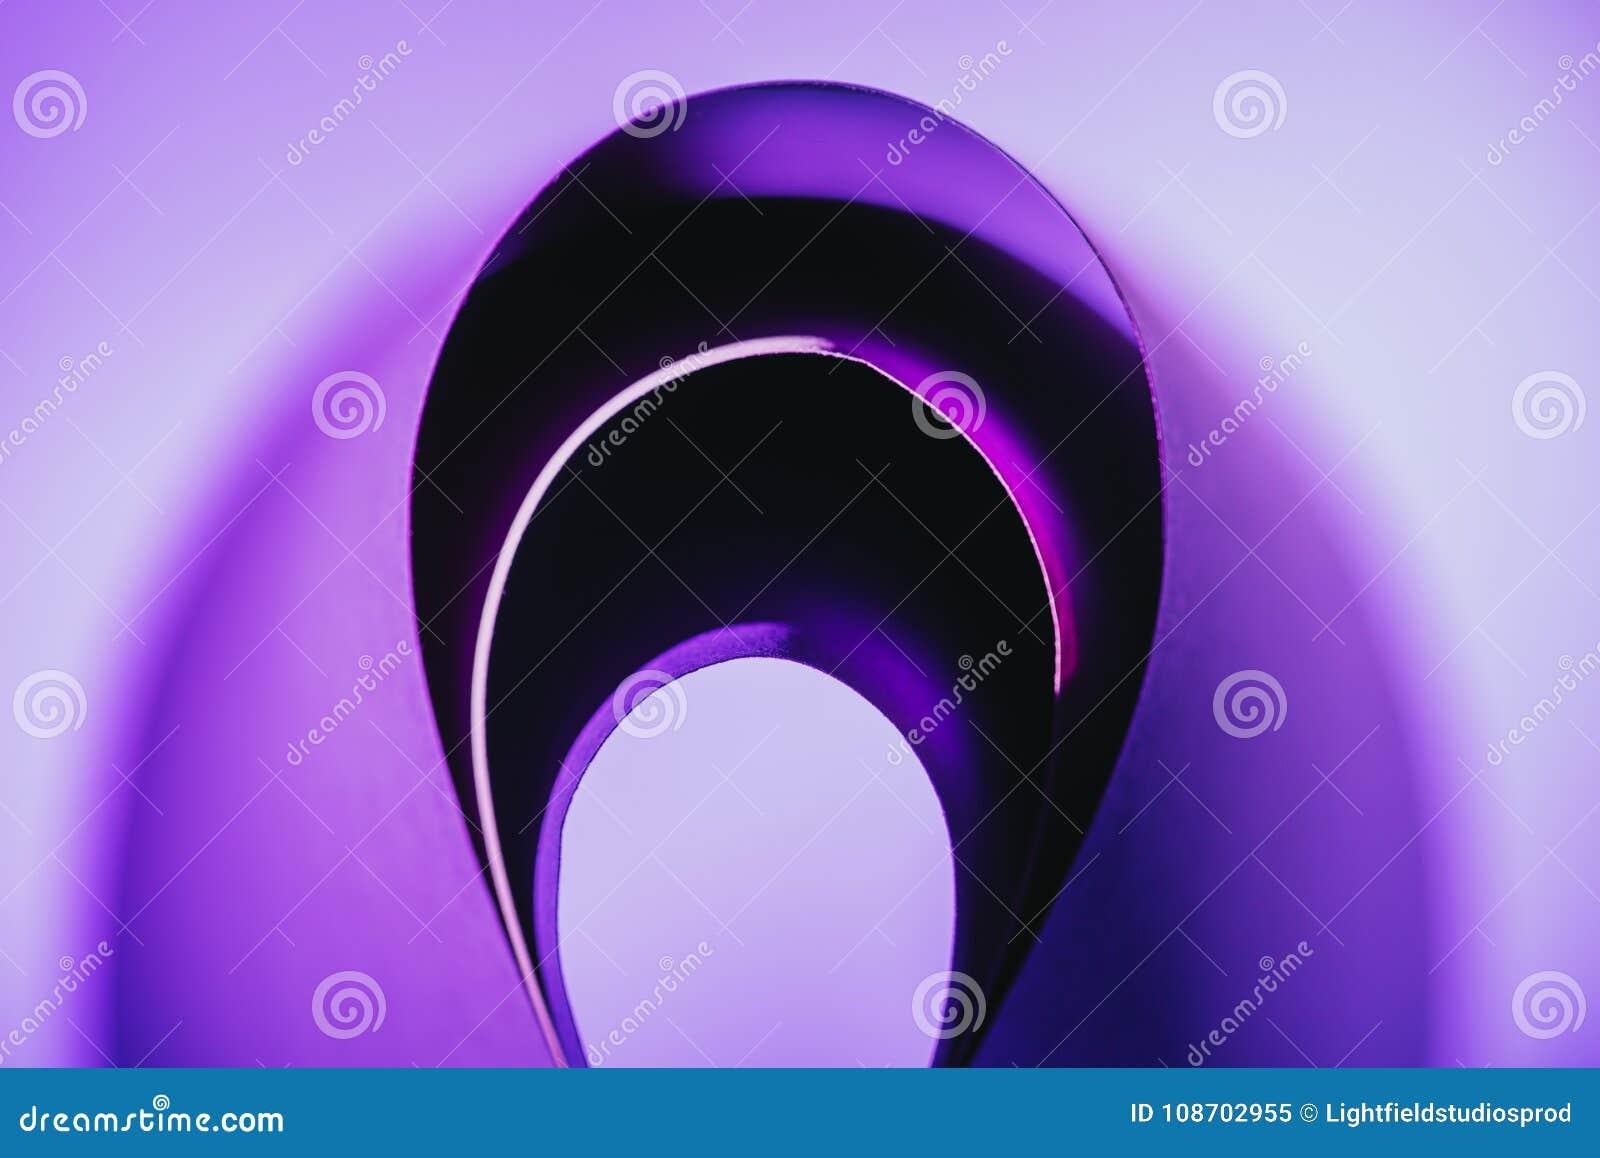 Arcs of warping purple paper